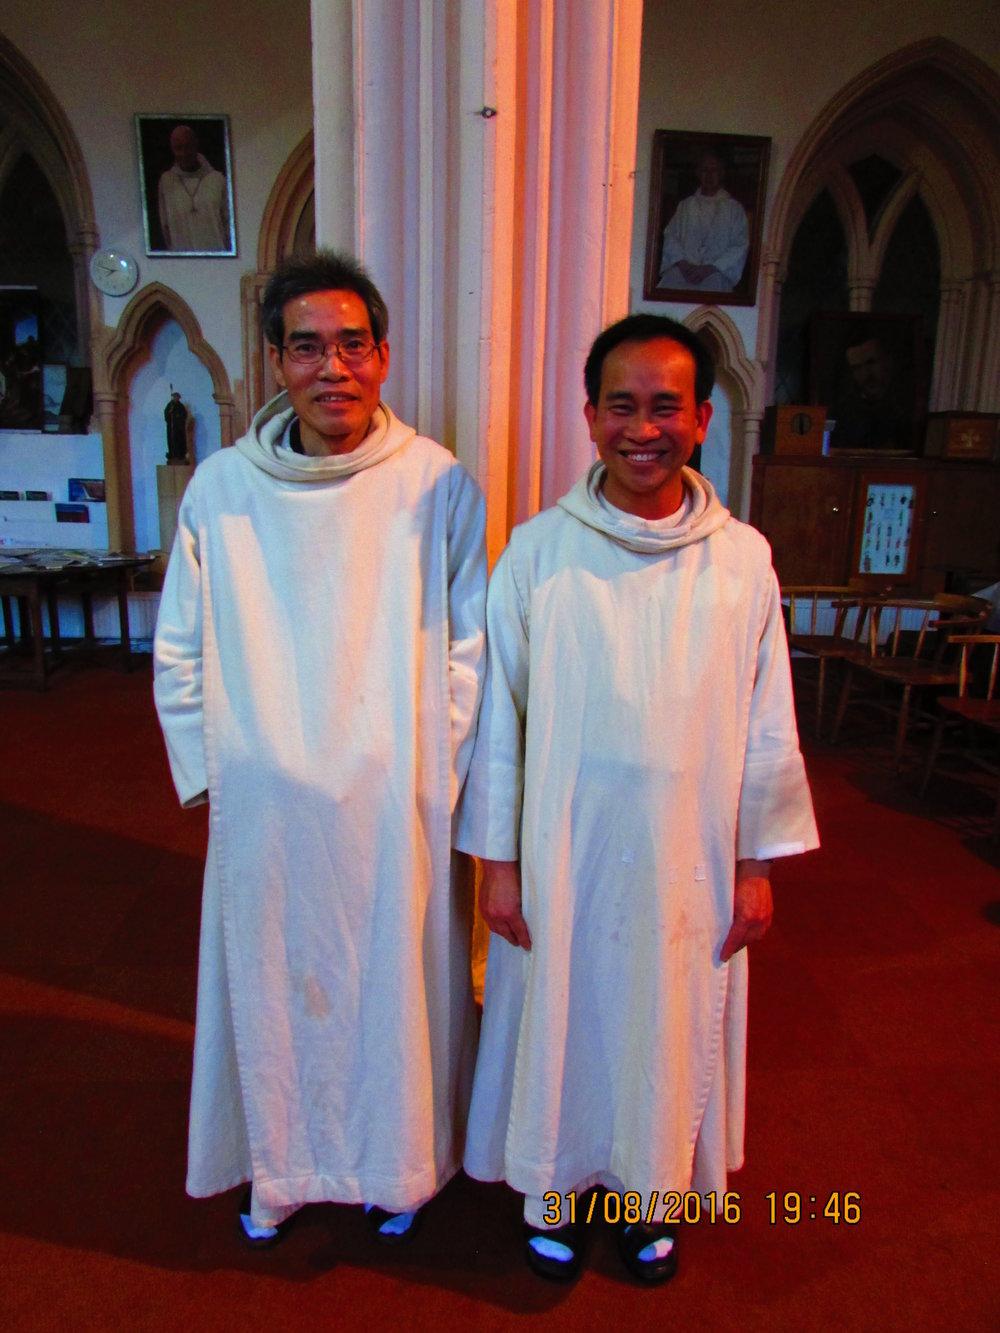 Br. John Baptist and Br. Joseph Eymard